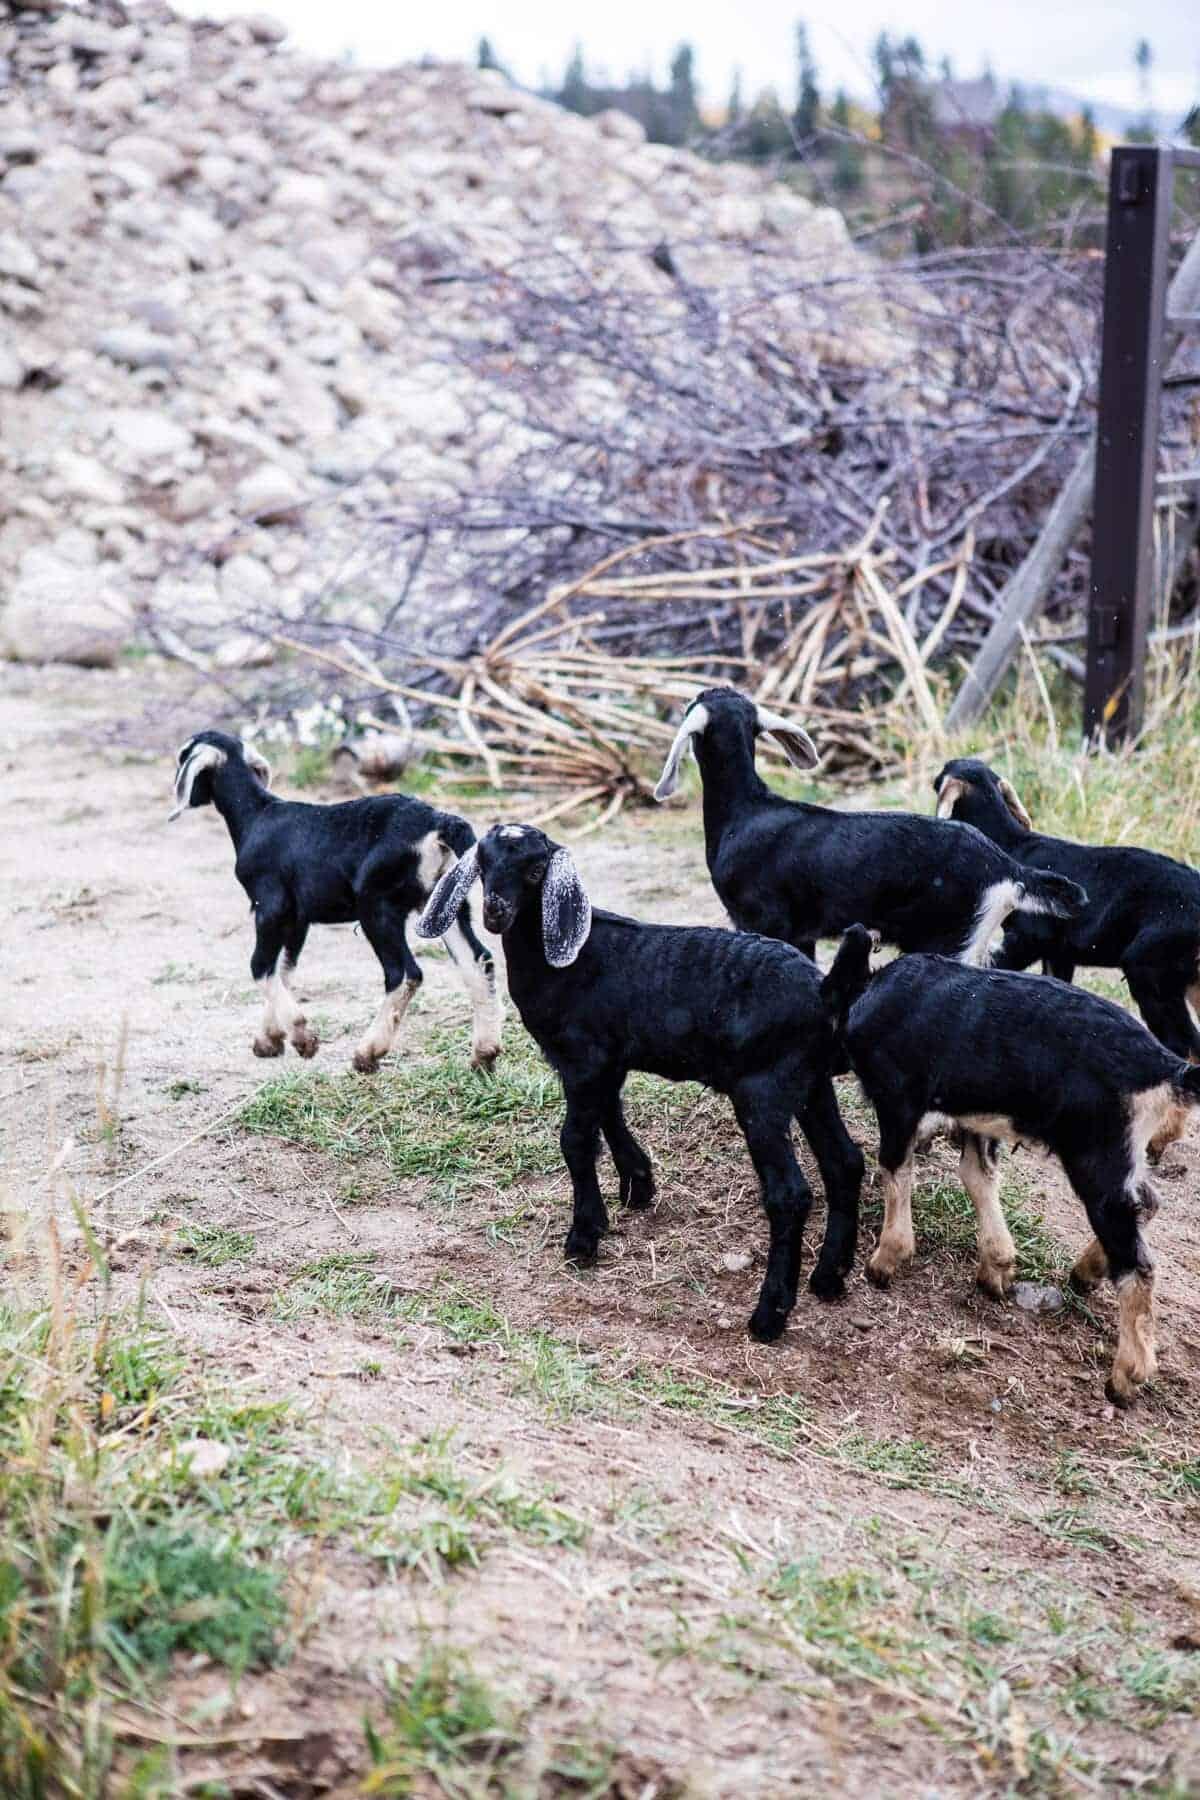 Baby Goat Photos + All Things Fall | halfbakedharvest.com @hbharvest